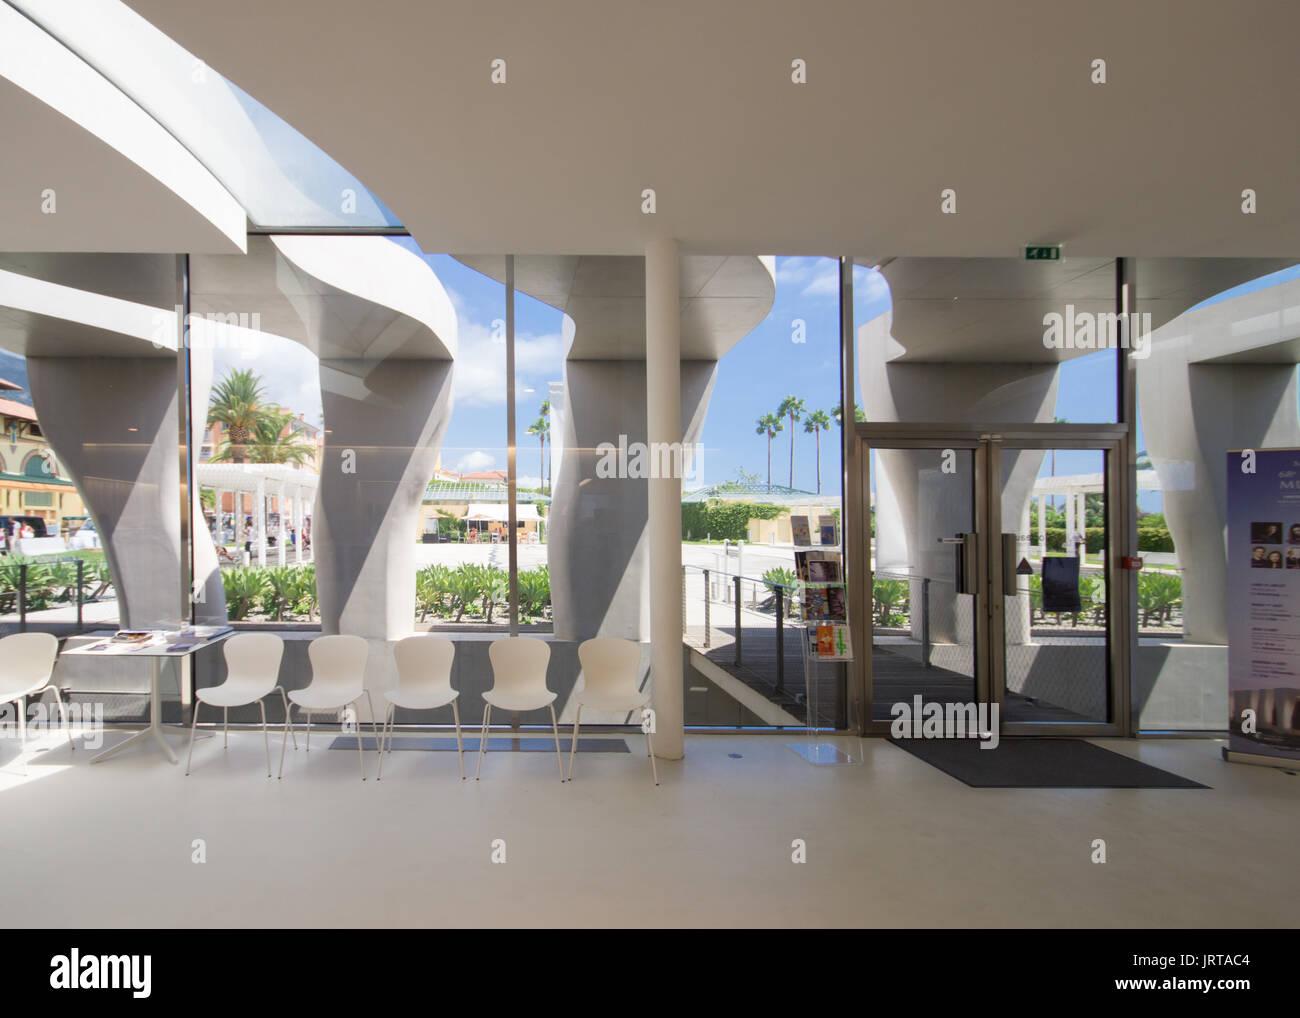 Jean Cocteau Museum, Menton, French Riviera: architect Rudy Ricciotti entrance lobby interior 1 Inexhibit - Stock Image